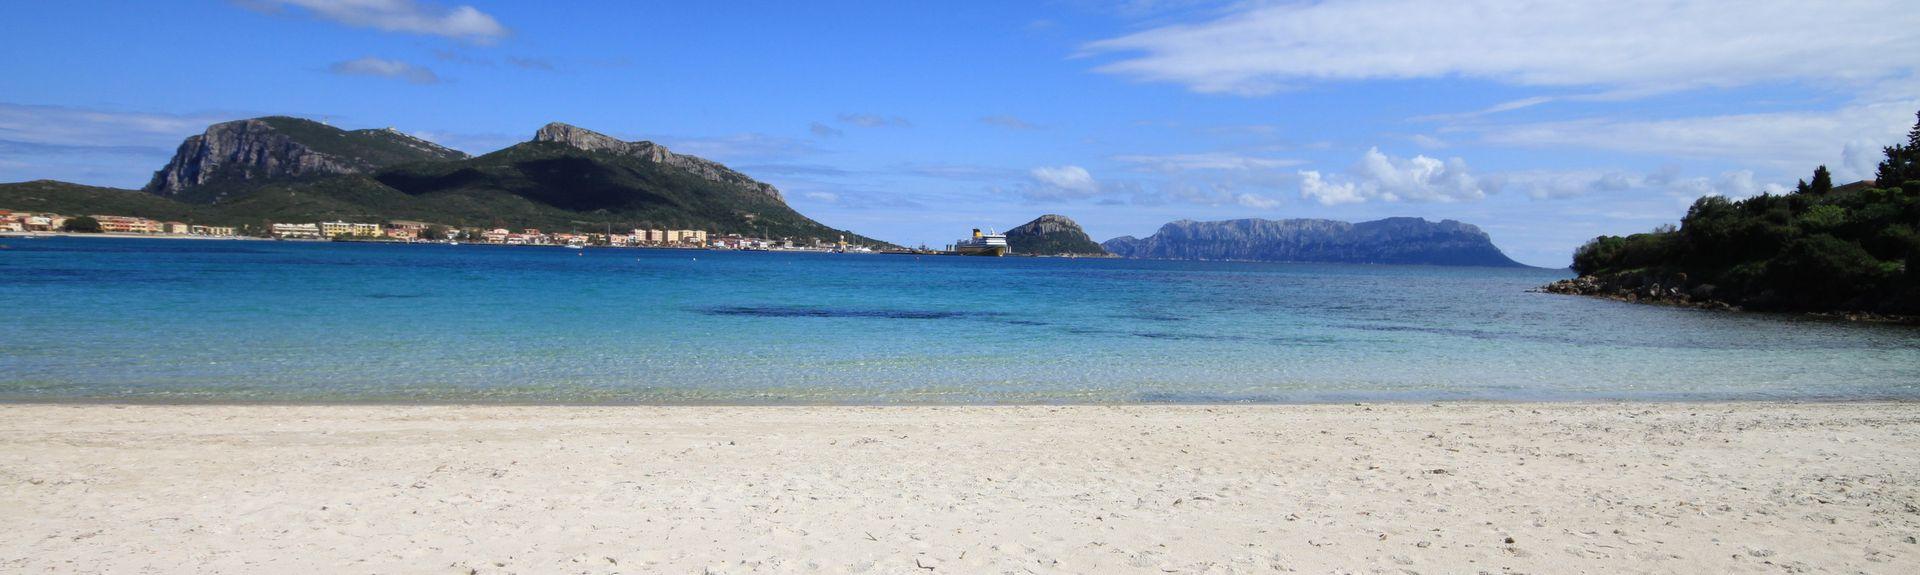 Costa Smeralda, Sardinien, Italien